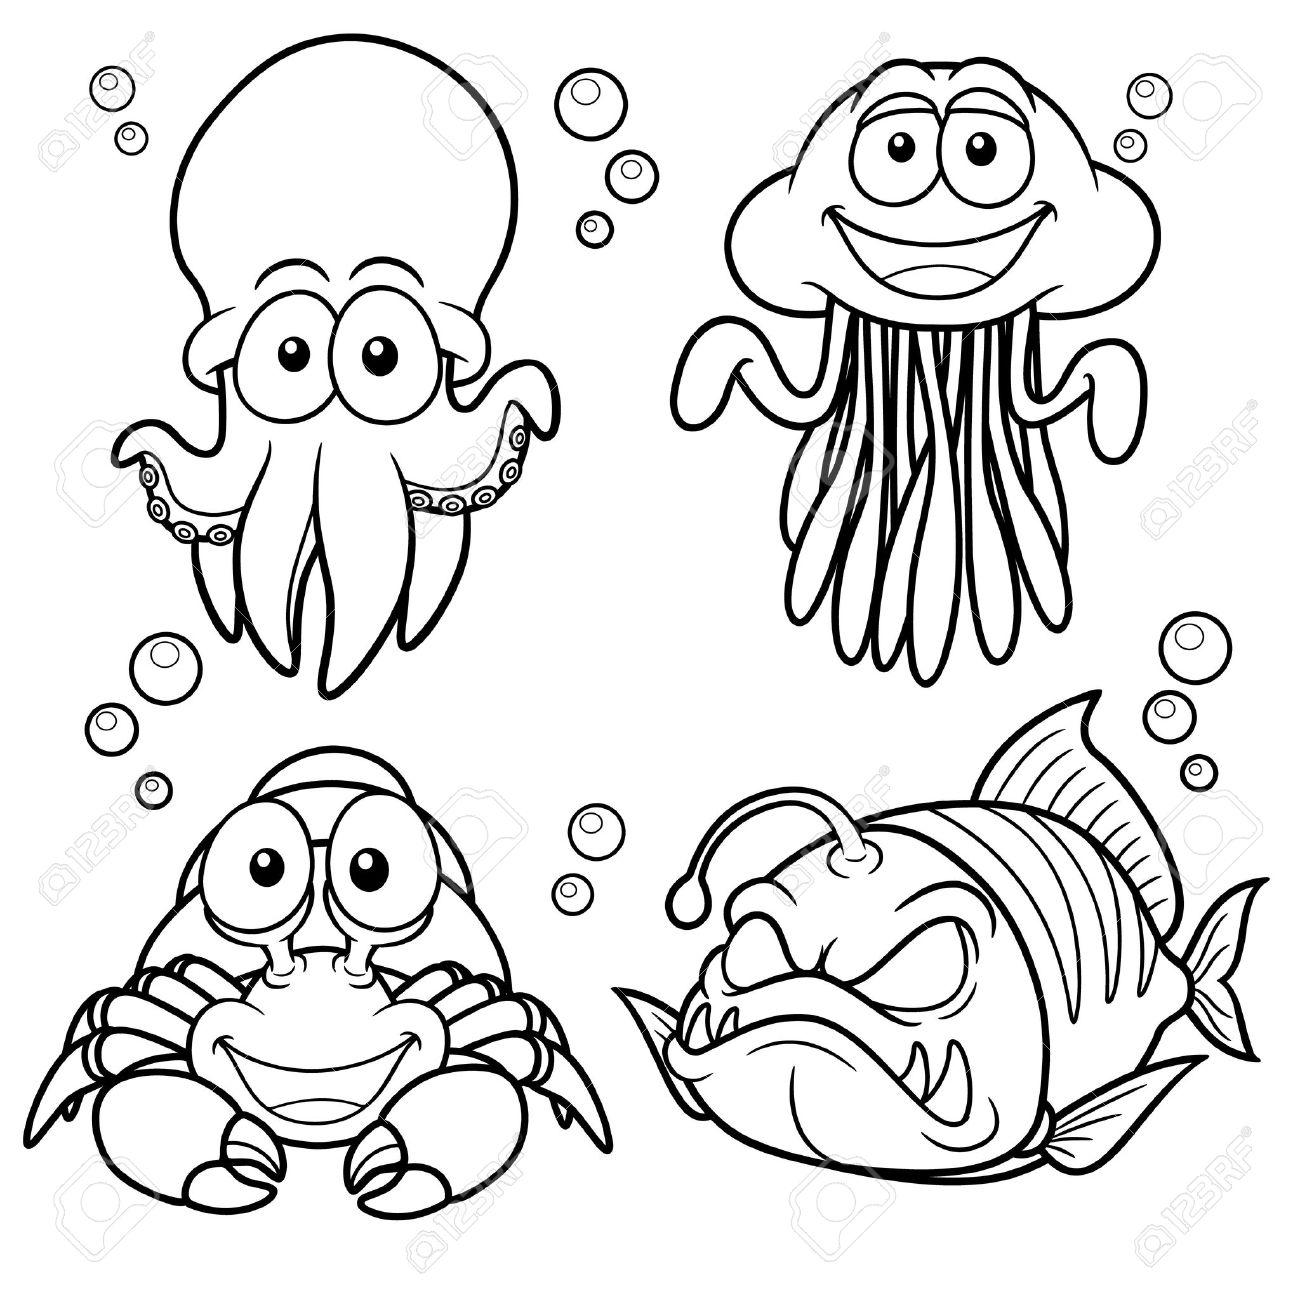 Vector illustration of Sea Animals cartoon - Coloring book Stock Vector - 18726577